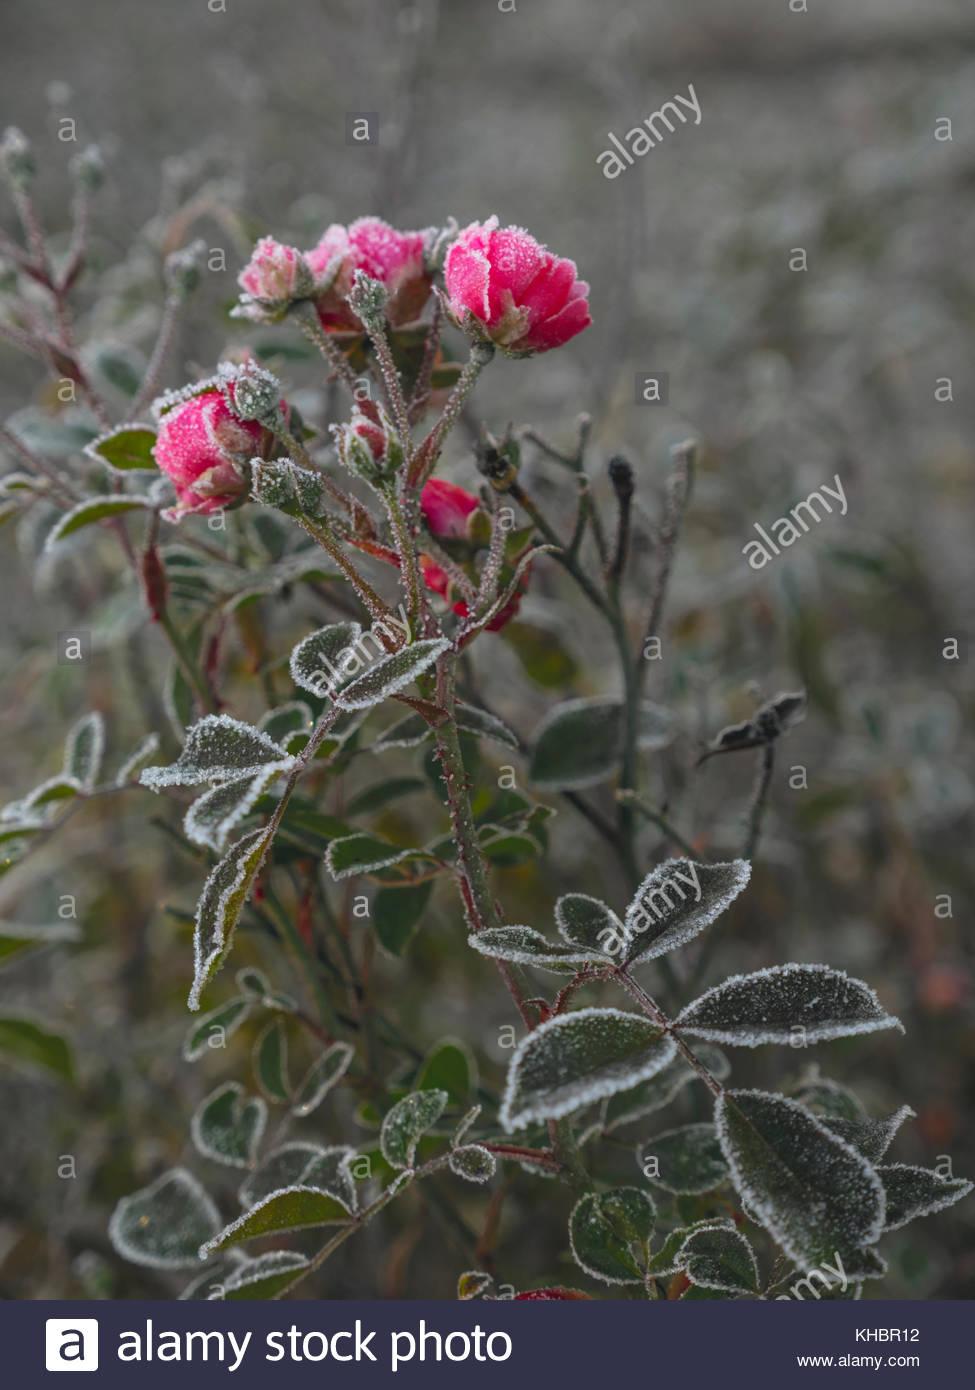 Frozen pink roses in a garden, pre-winter in Northern Europe, Scandinavia, Sweden - Stock Image